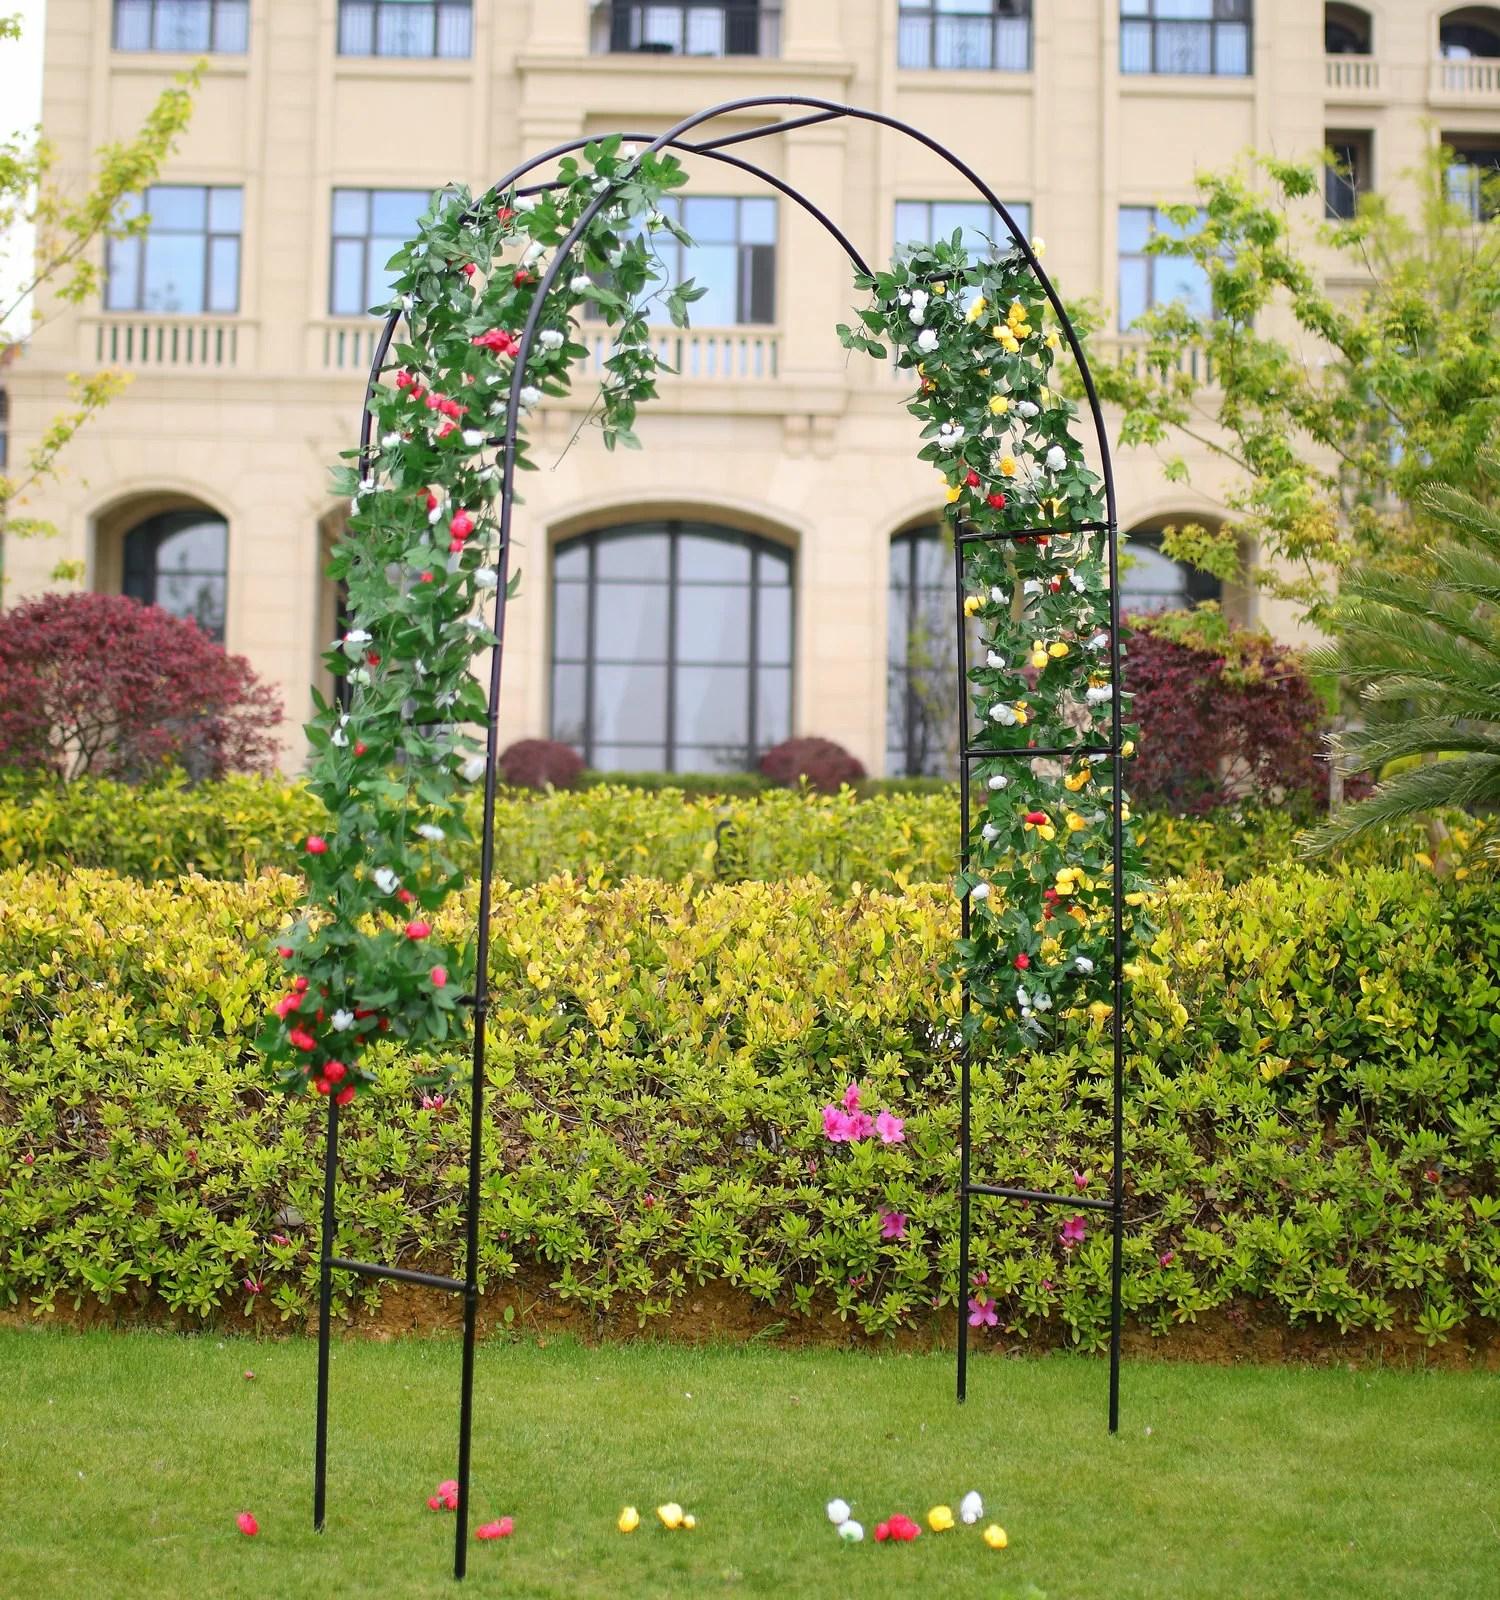 1 Go Steel Garden Arch 7 8 High X 4 5 Wide Garden Arbour For Various Climbing Plant Reviews Wayfair Ca